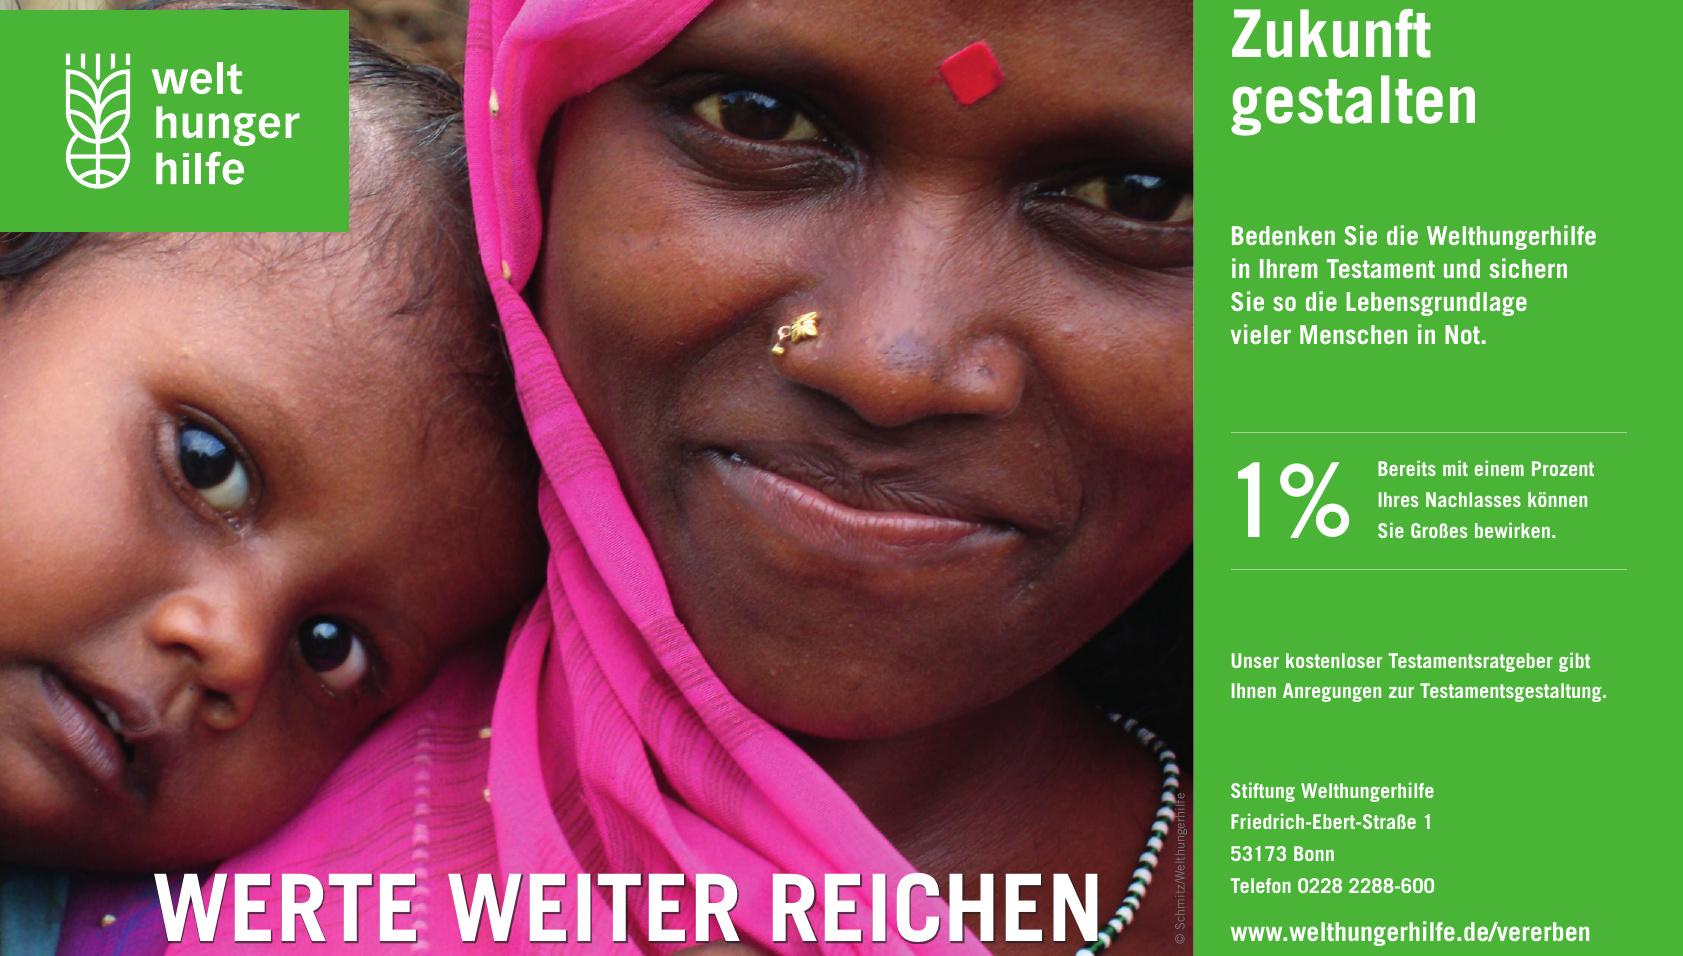 Stiftung Welthungerhilfe